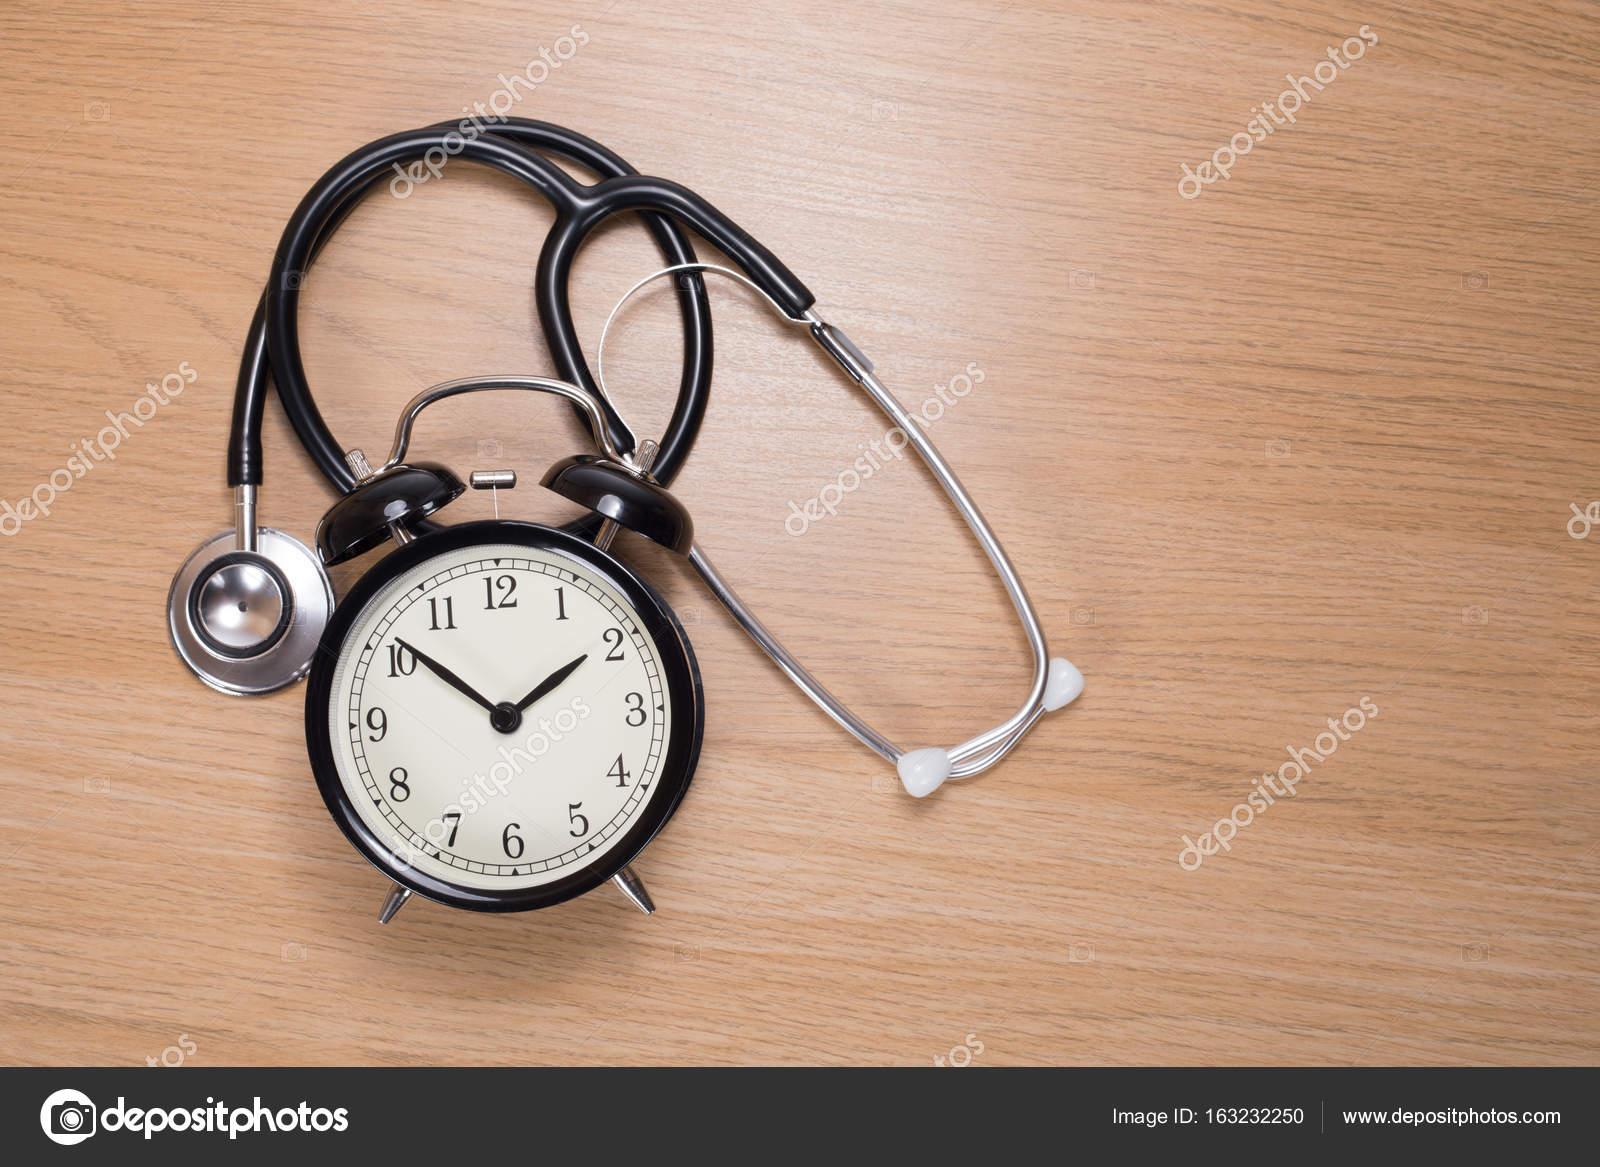 stethoscope with alarm clock lying on wooden desk stock photo